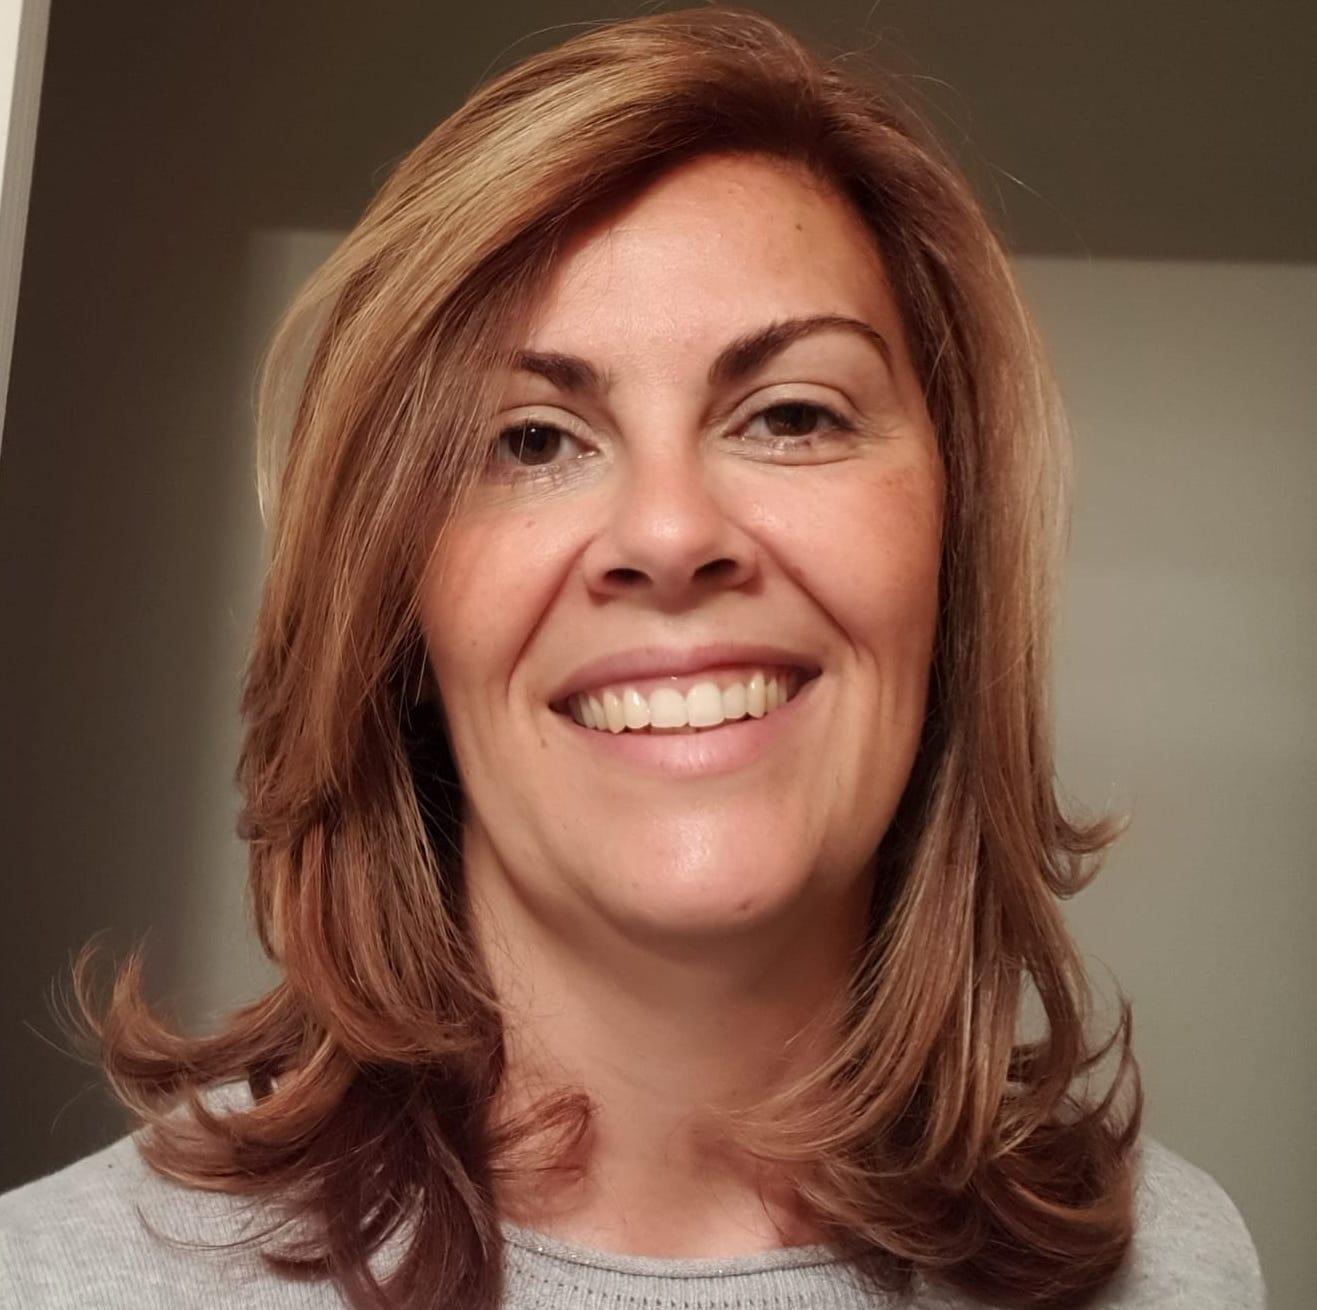 Mónica Suárez Rojas